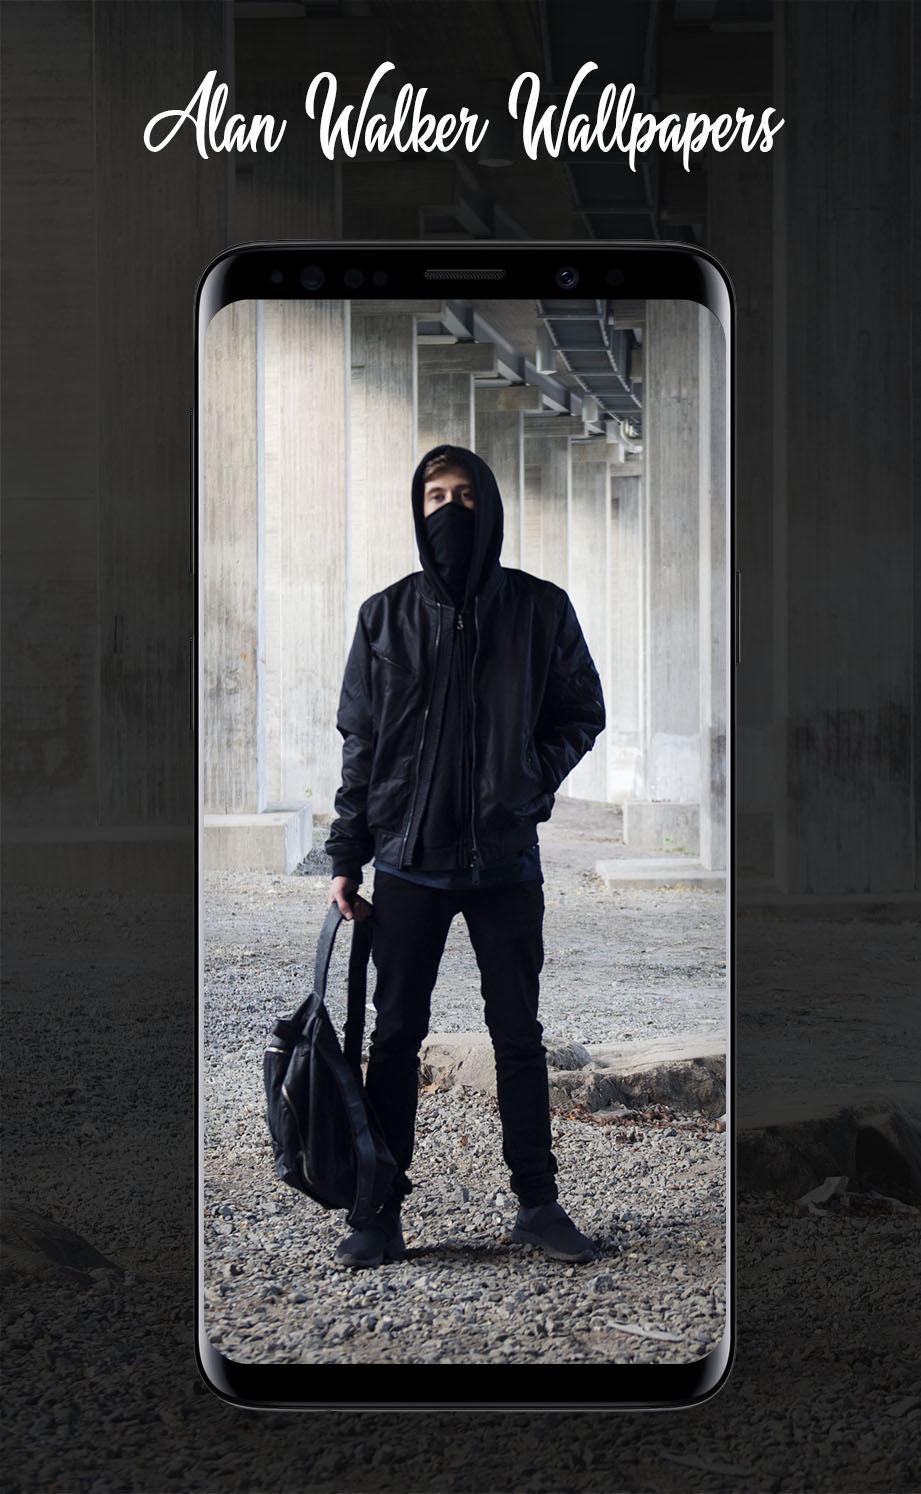 Alan Walker Wallpaper Hd 4k For Android Apk Download